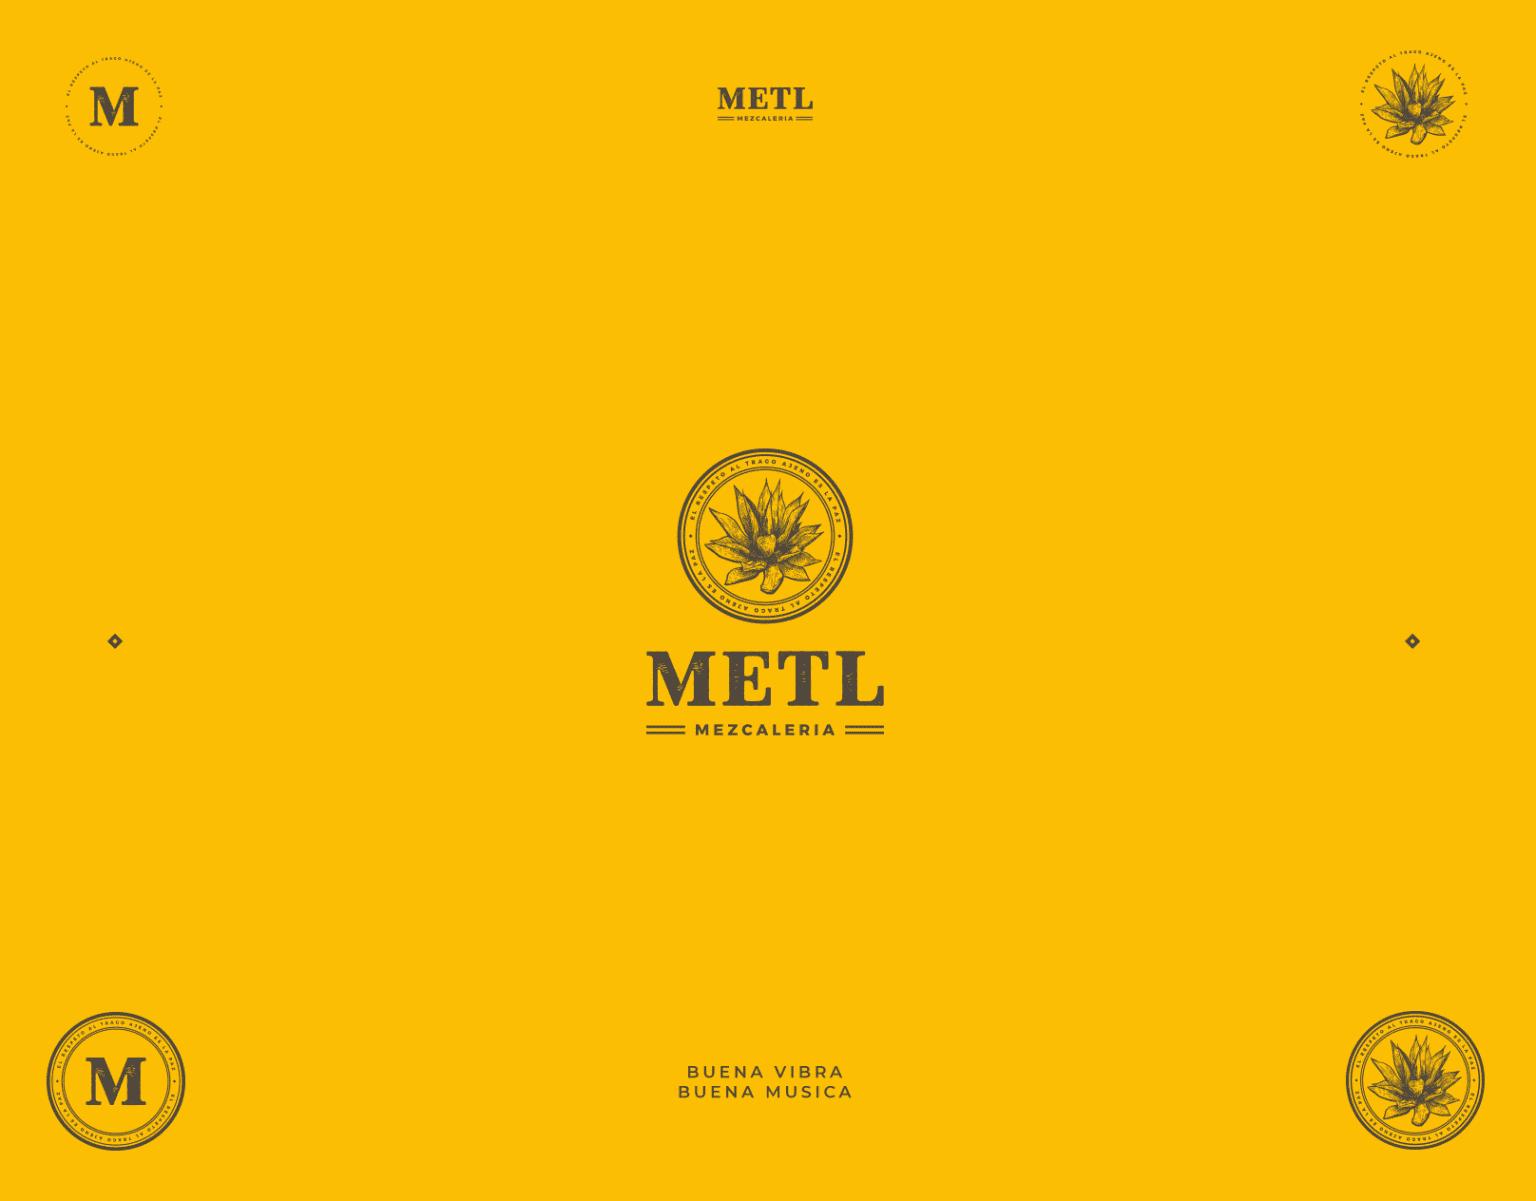 Metl Mezcaleria - Brand Identity